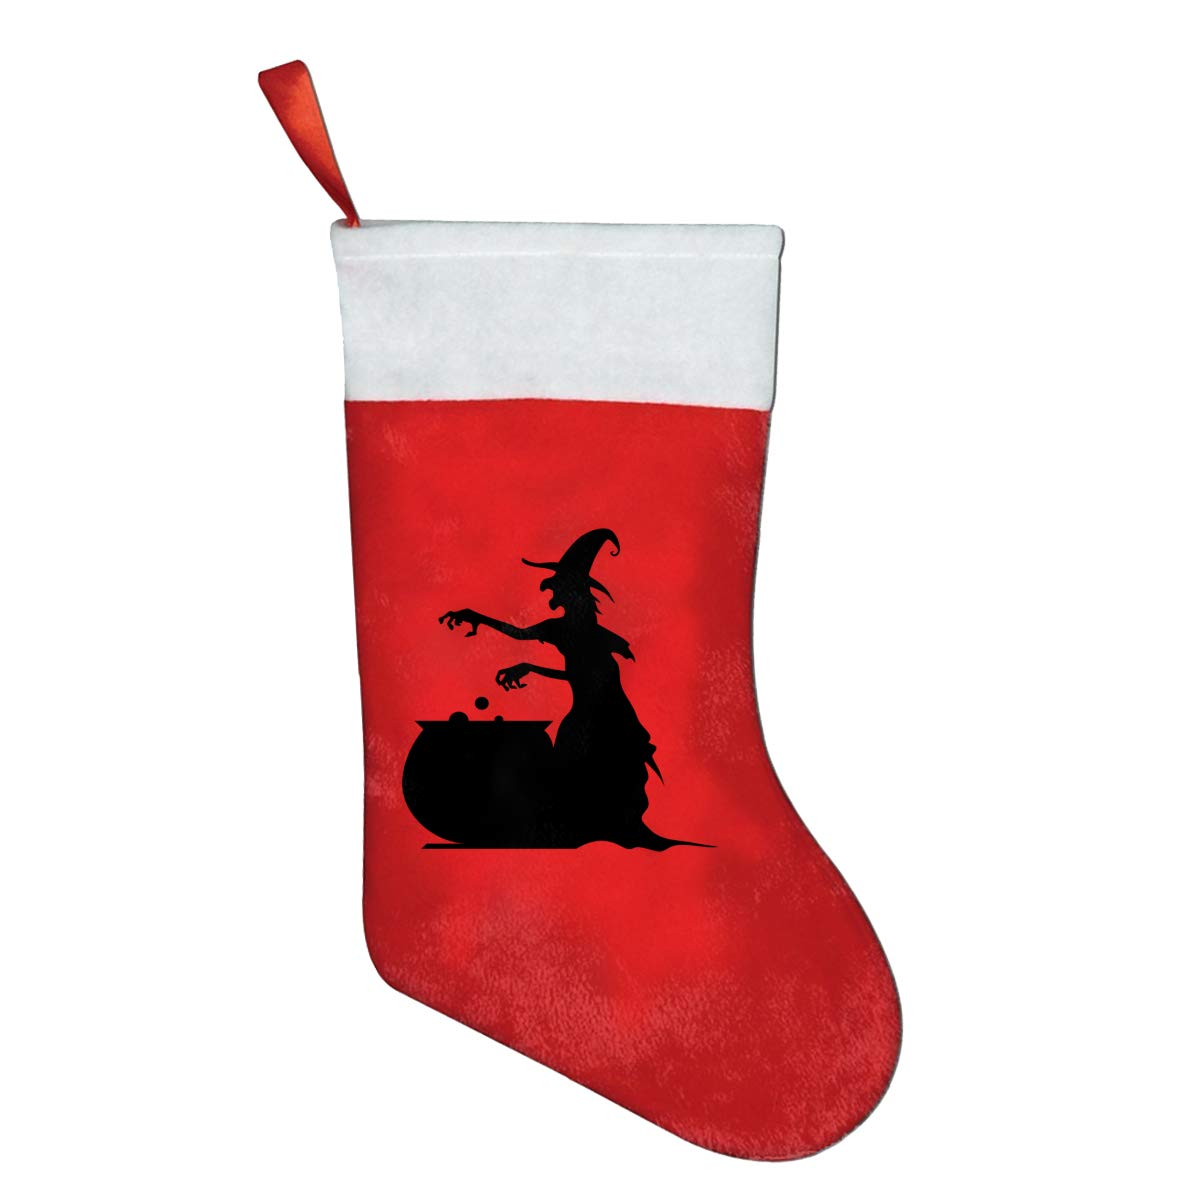 Making Christmas Stocking.Amazon Com Subensm Witch Making Ingredients Christmas